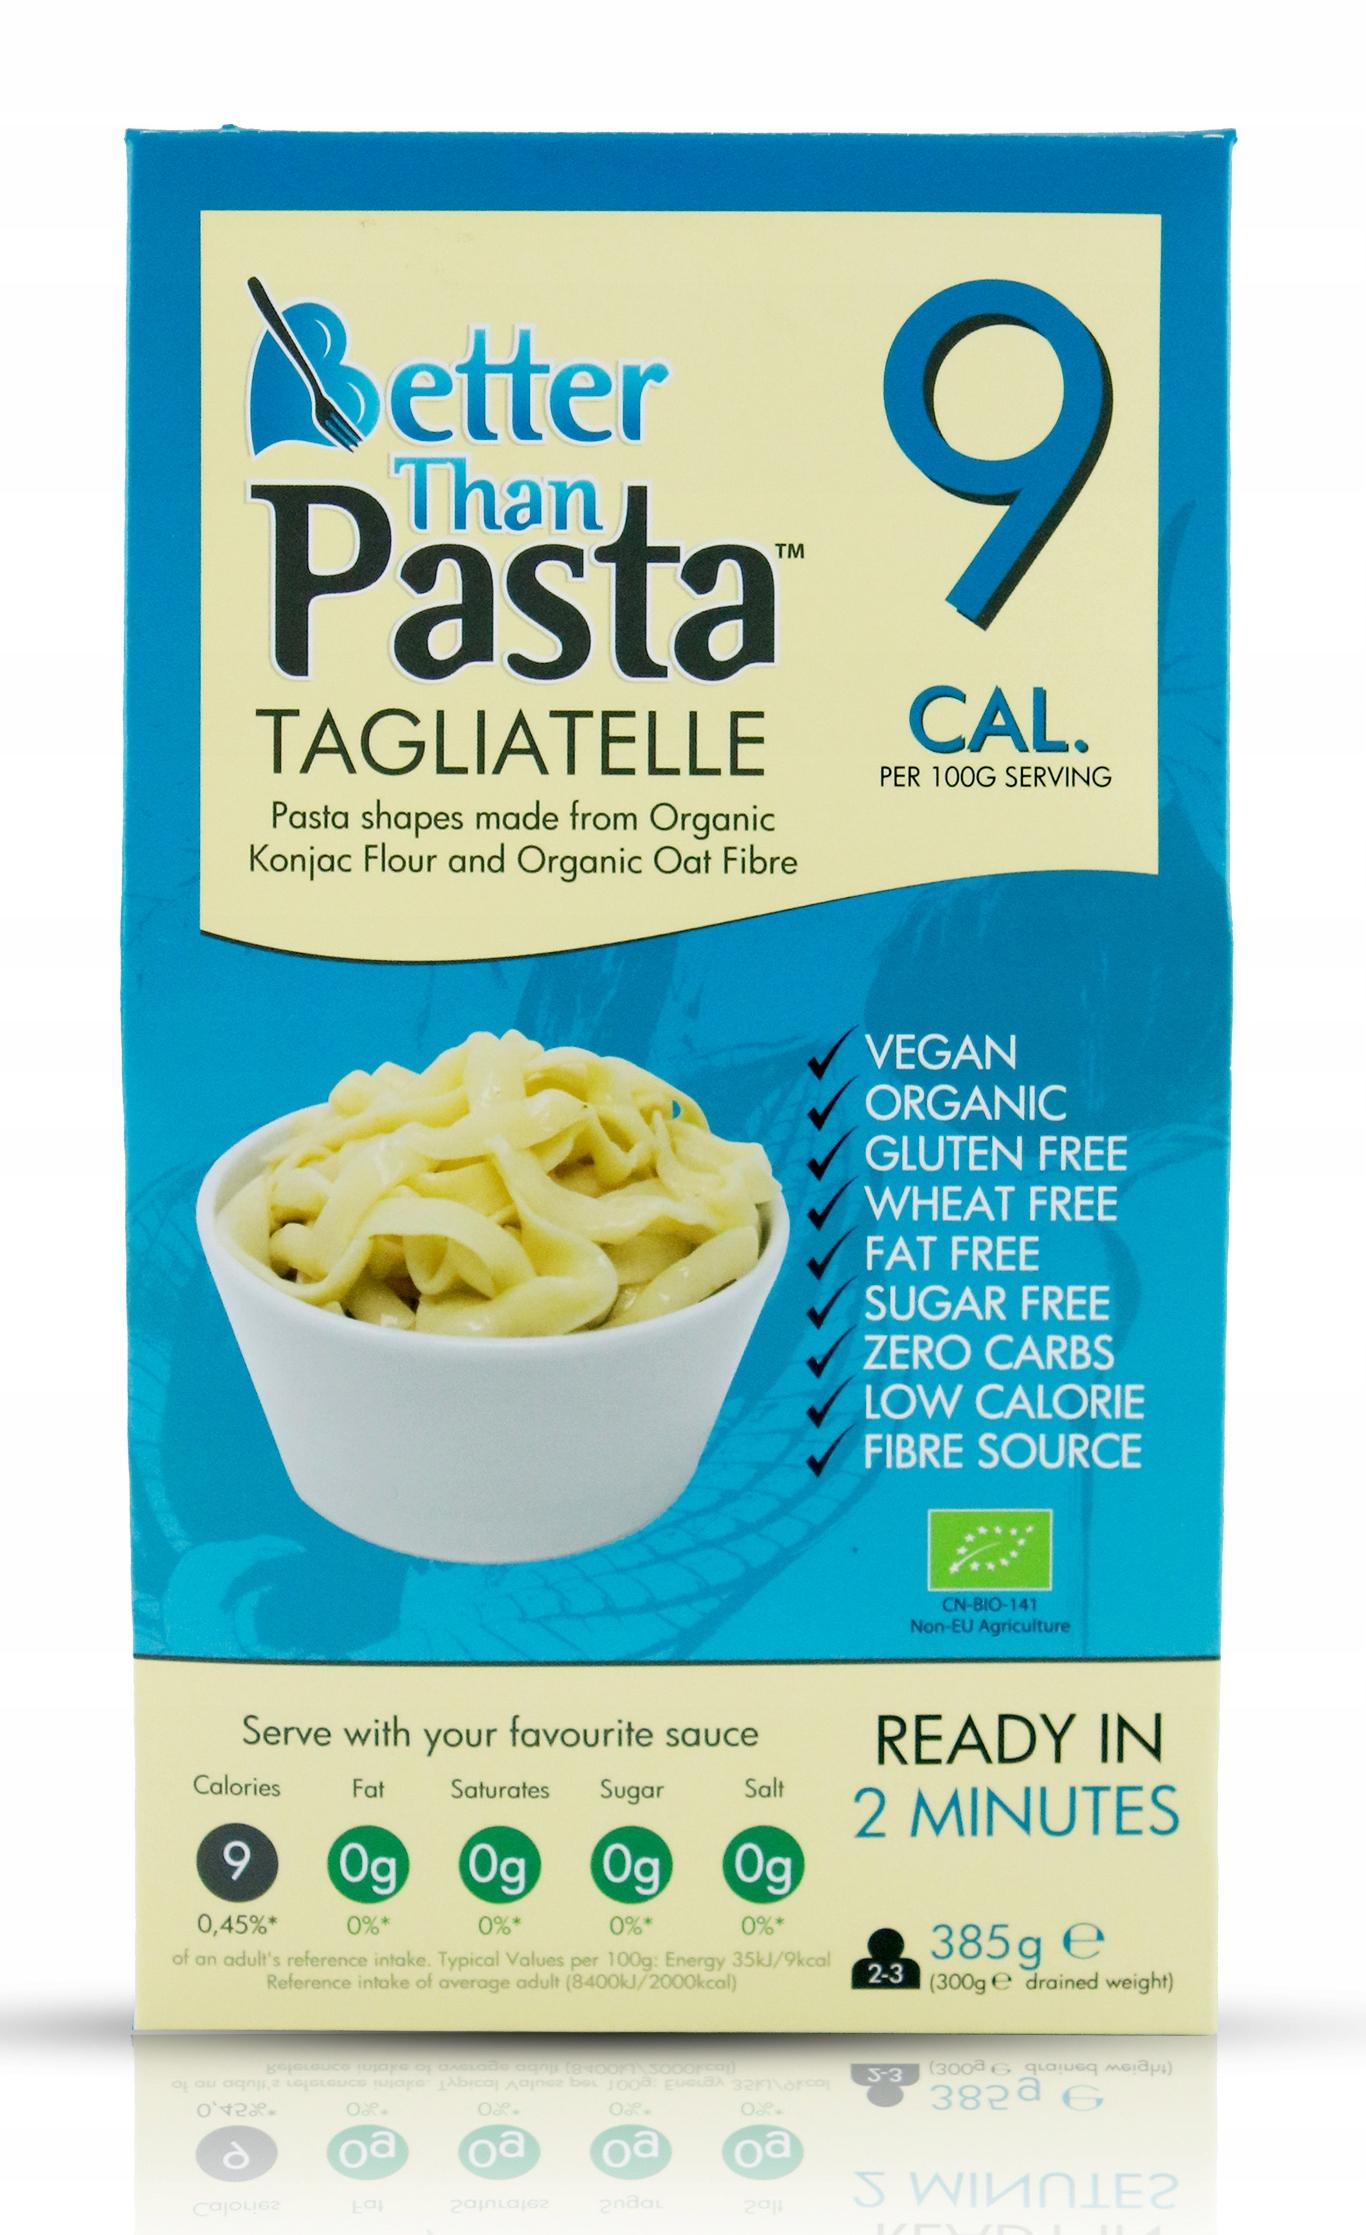 Makaron Tagliatelle Better Than Foods 9kcal - keto